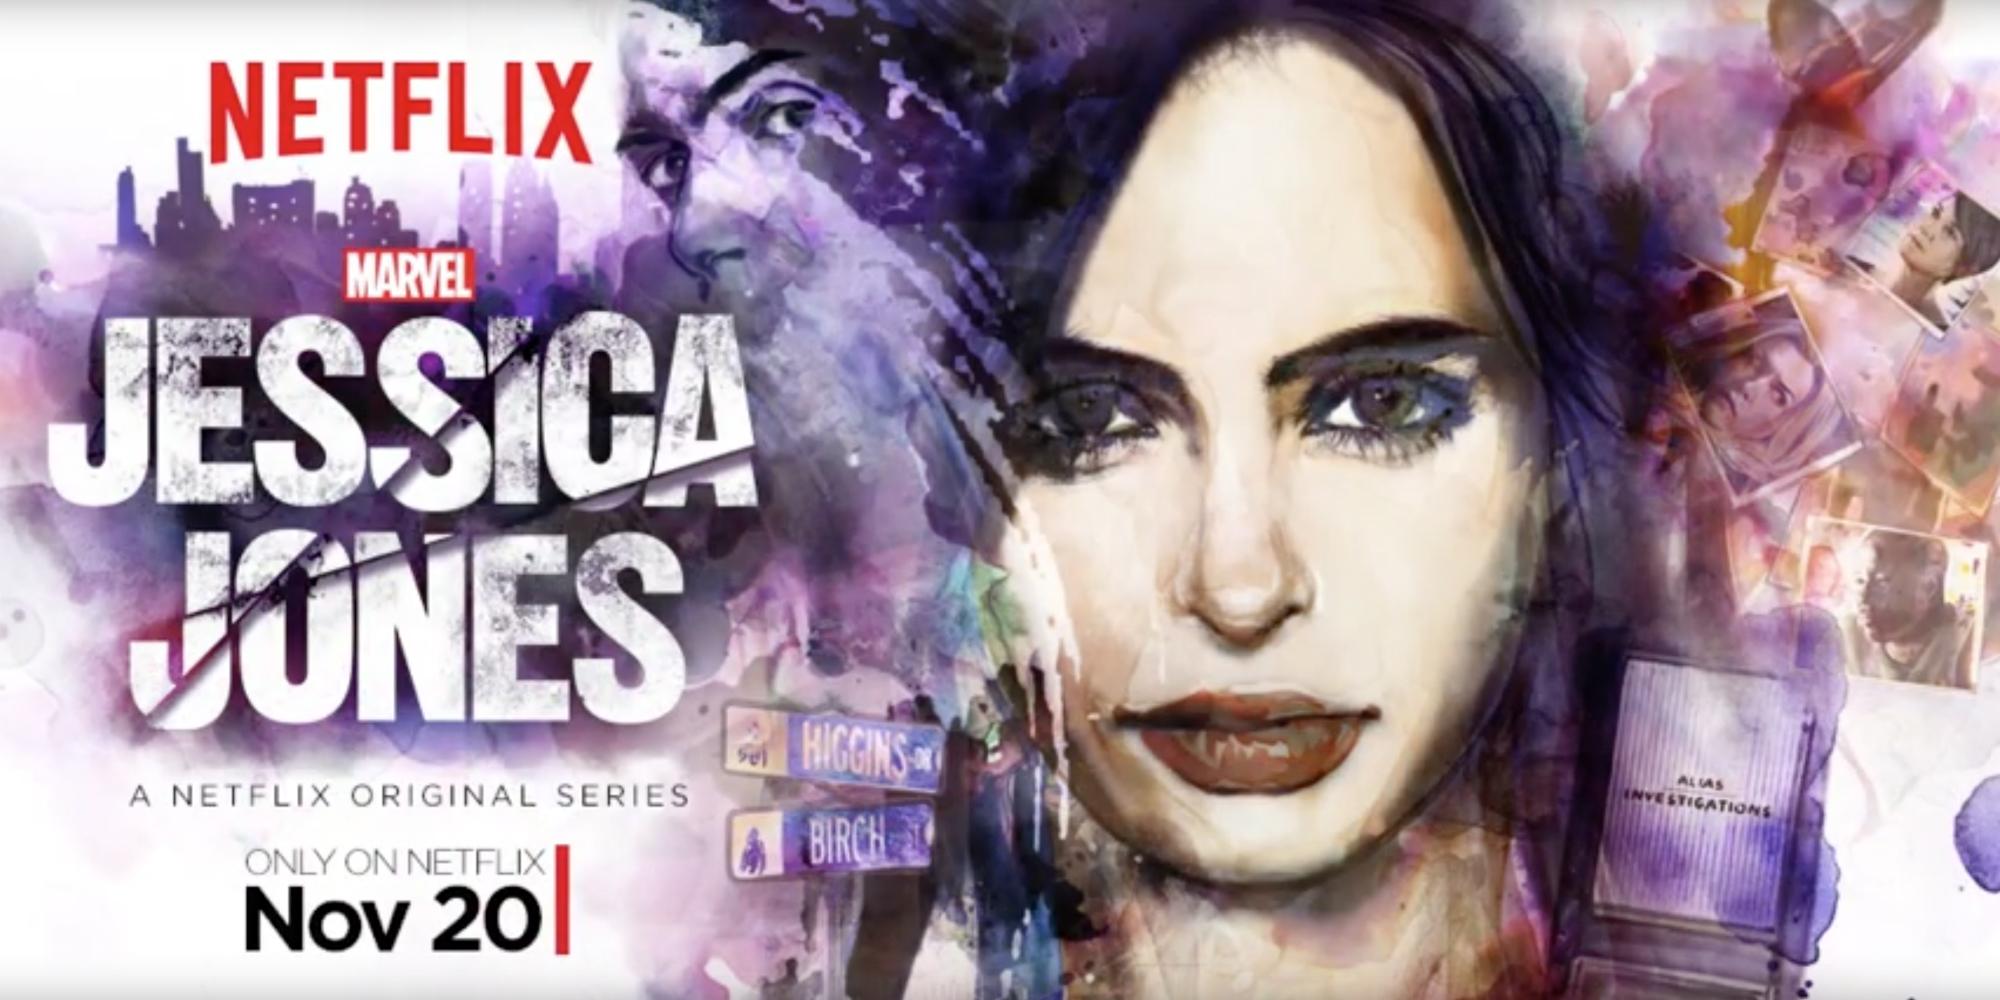 The Argonaut – A K A  binge worthy — Netflix and Marvel